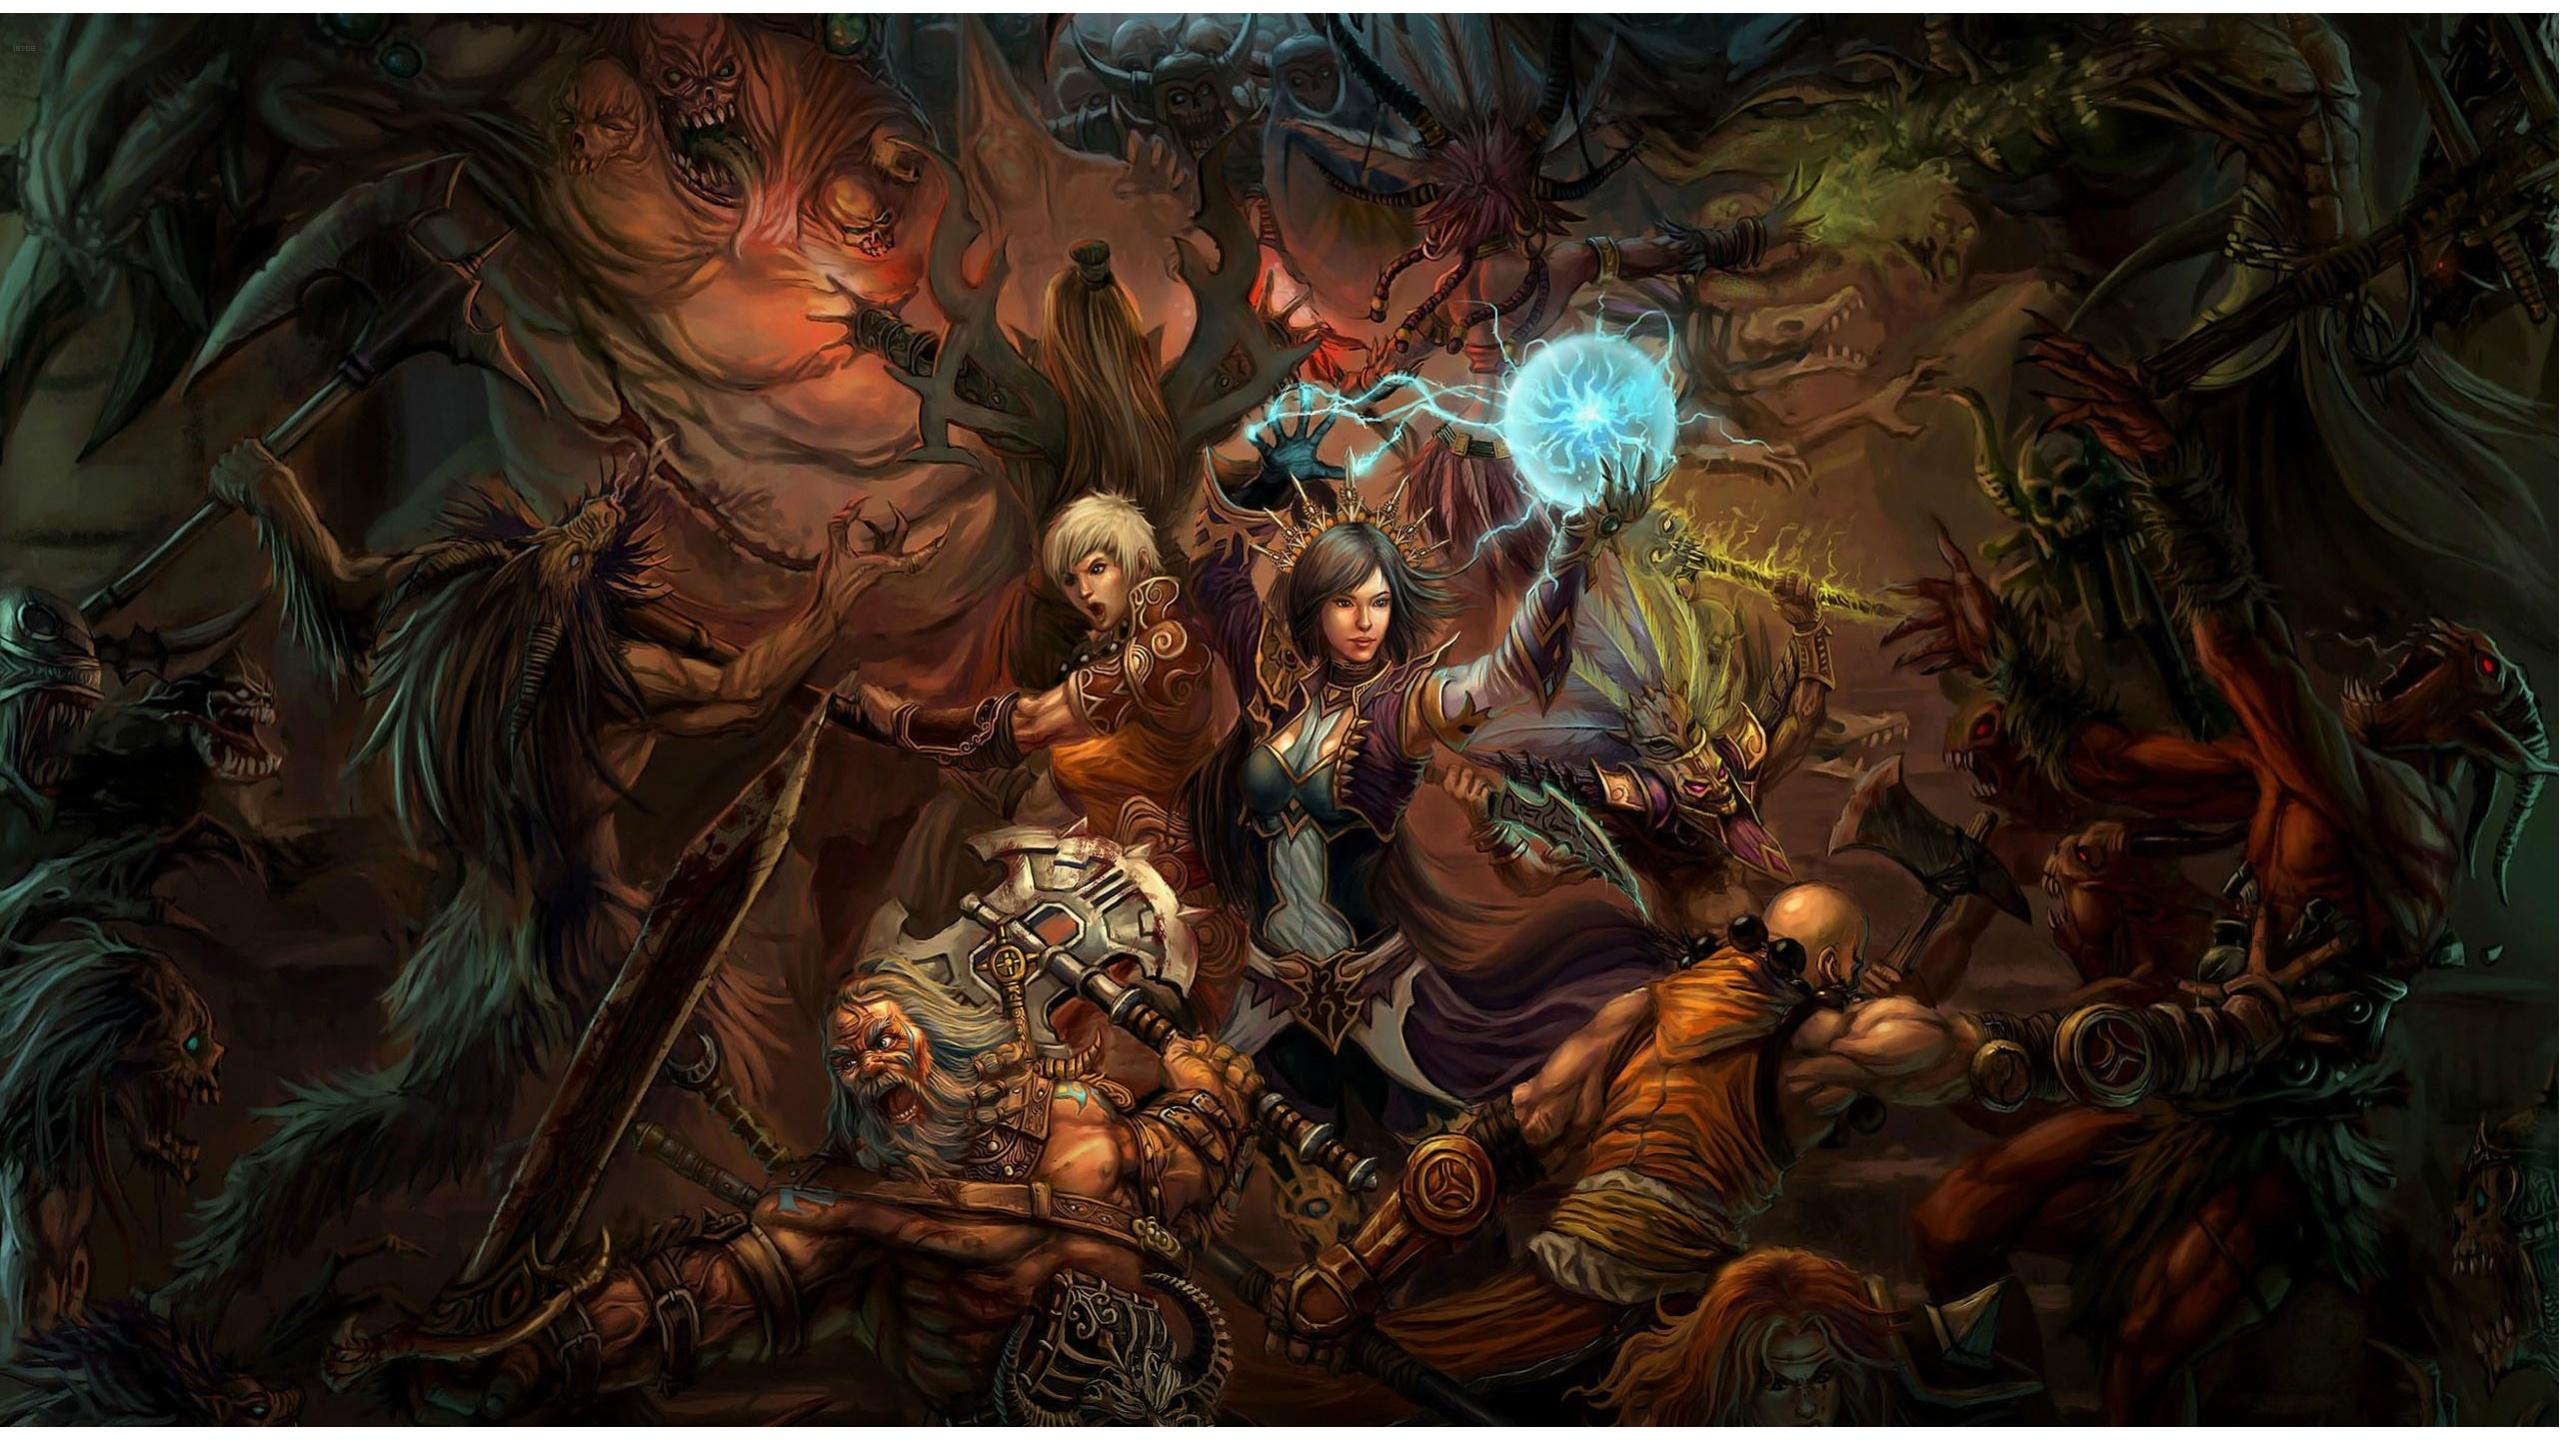 Bloody Battle In Diablo 3 Game Wallpapers   2560x1440   1045157 2560x1440